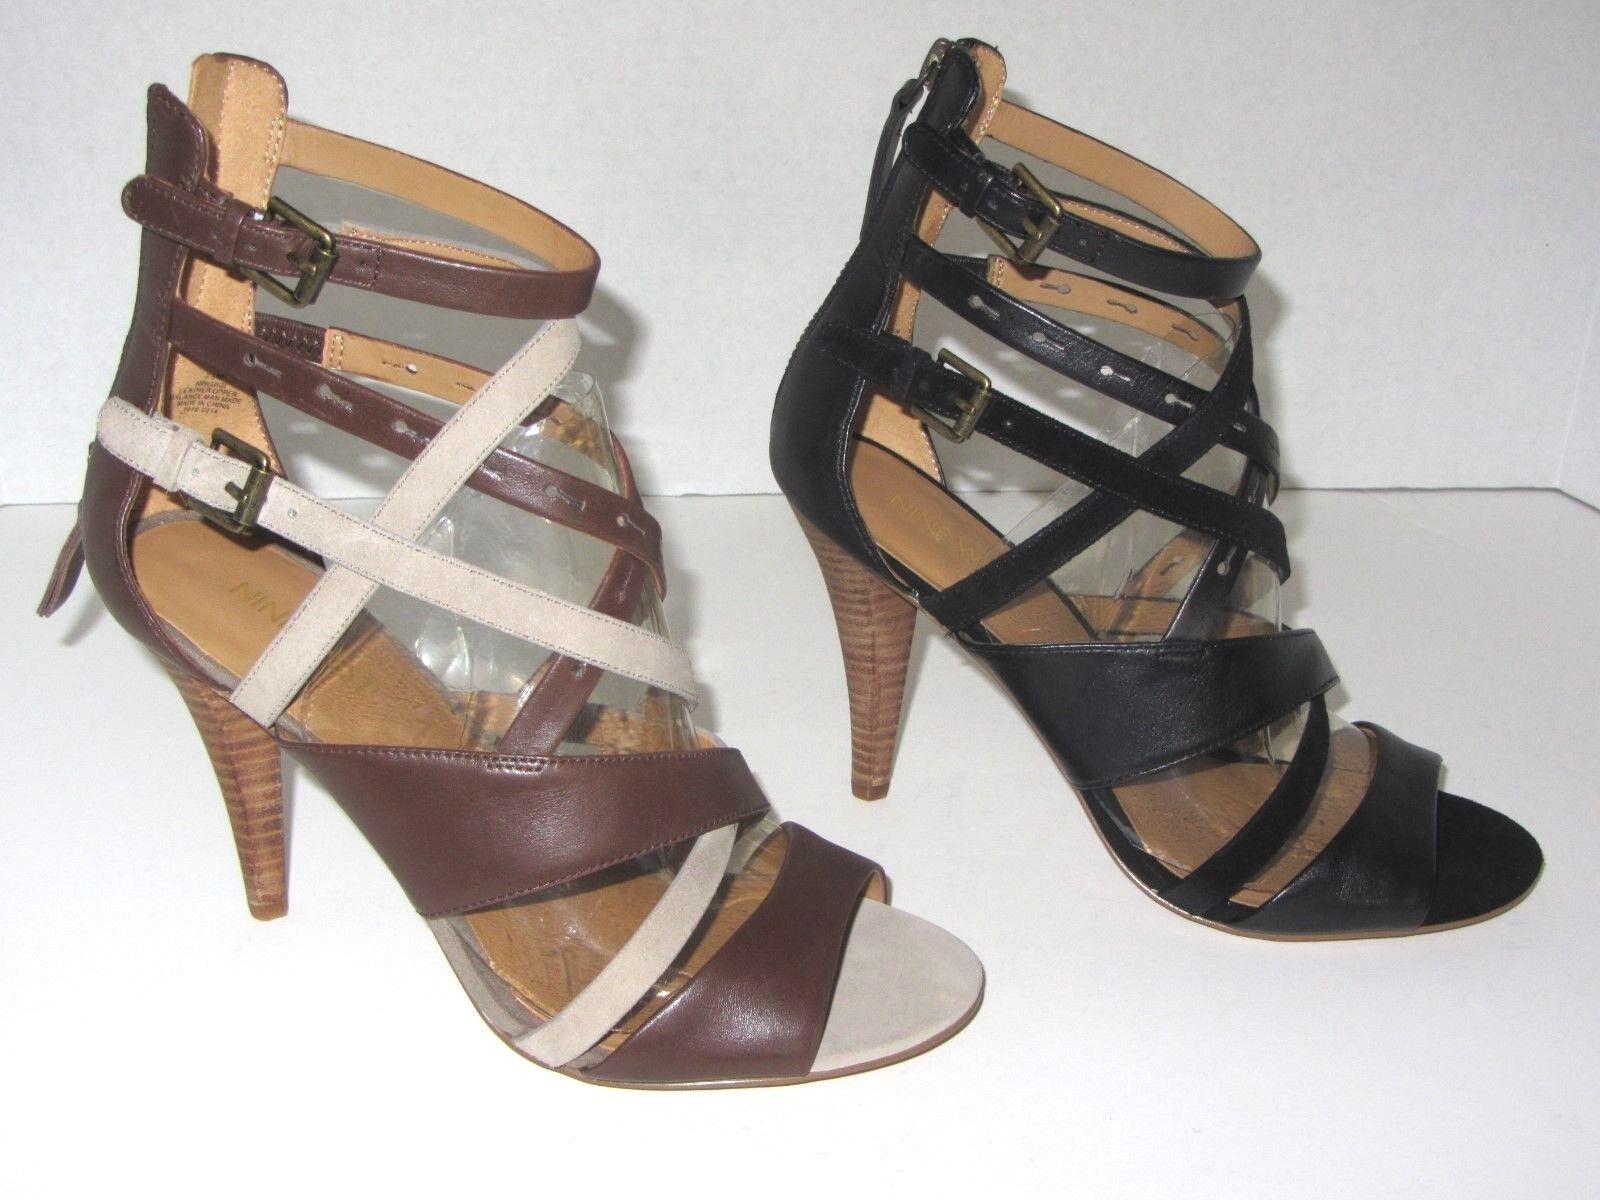 New Womens Nine West Luigi Sandal Strappy Leather Shoes Size 8